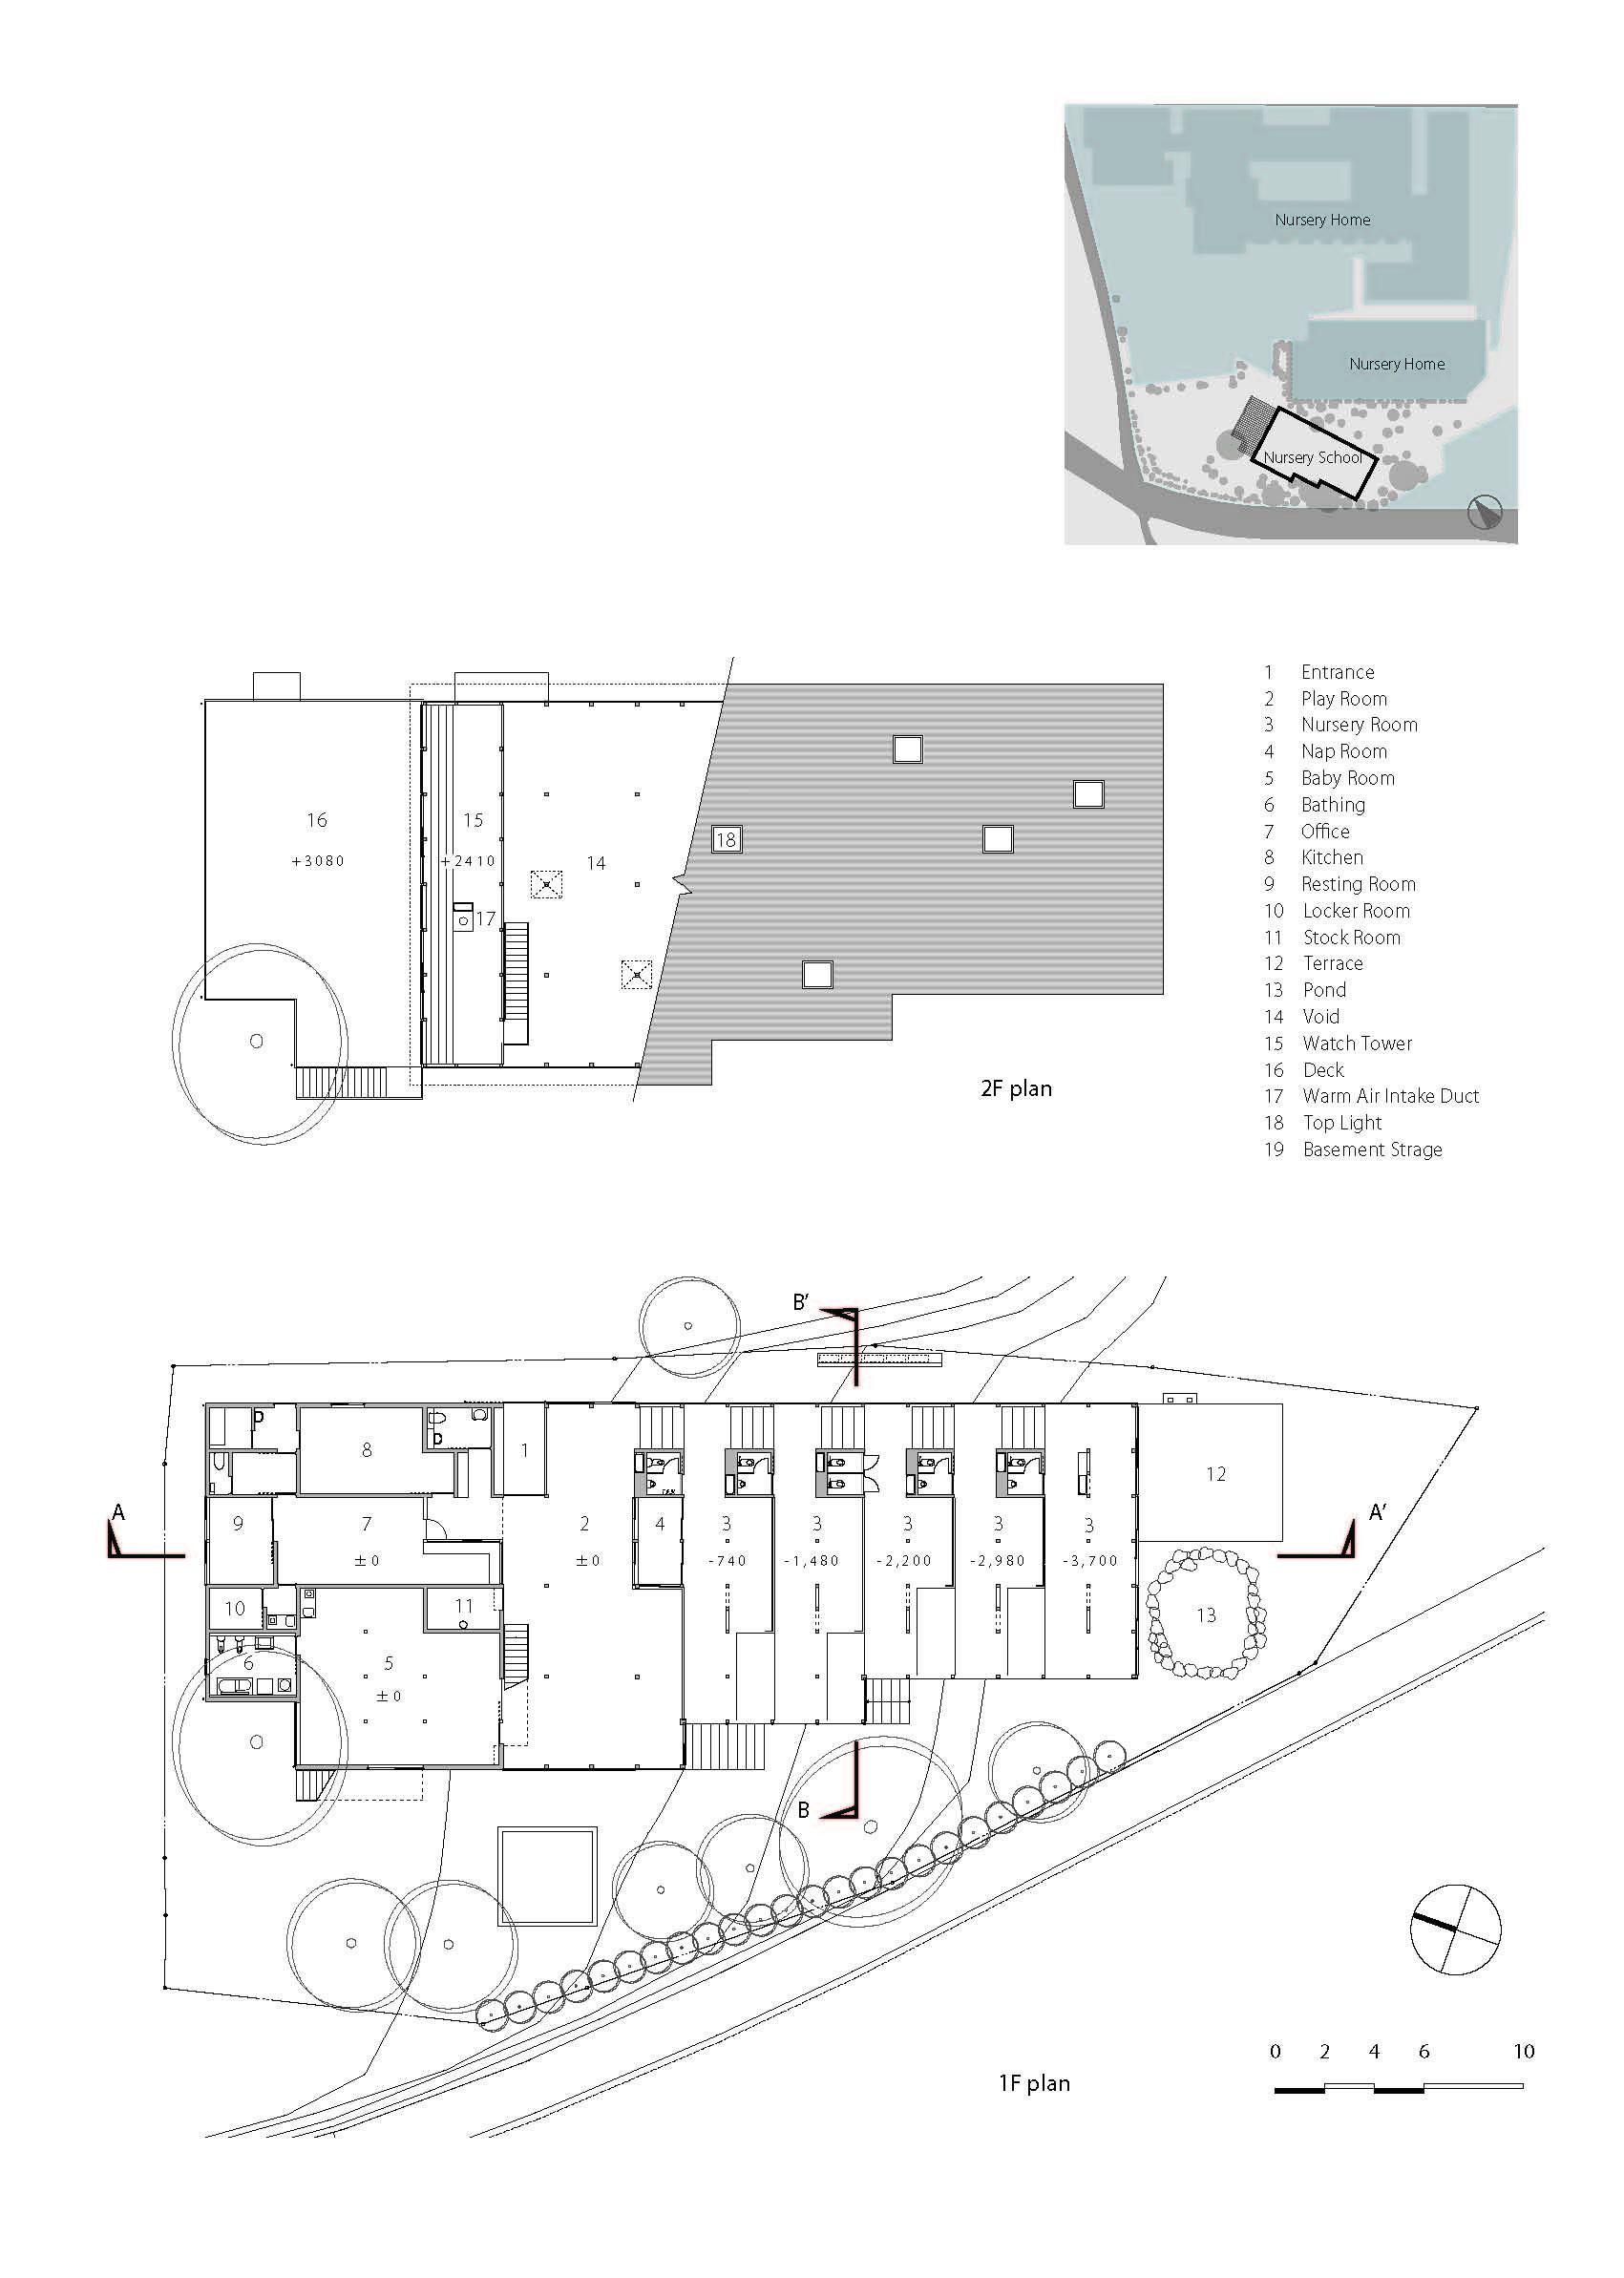 Hakusui Nursery School Yamazaki Kentaro Design Workshop ArchDaily - Naval architecture schools